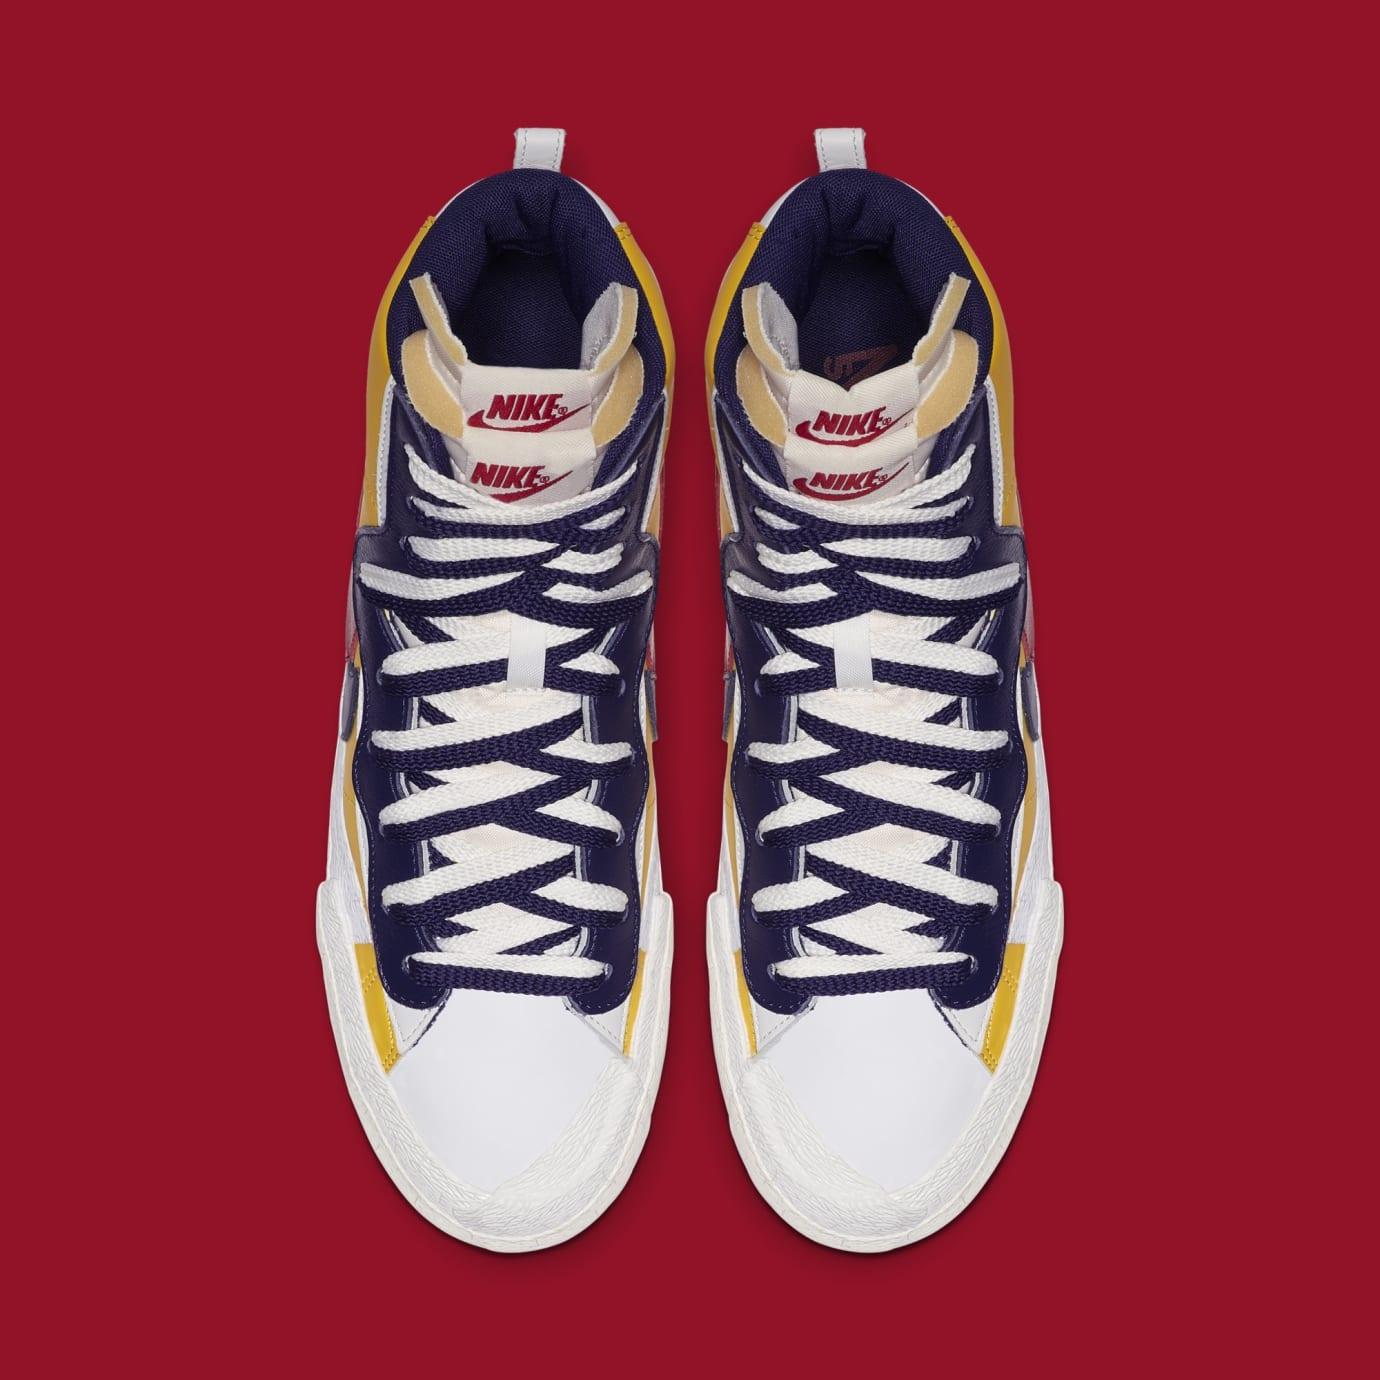 Sacai x Nike Blazer High 'Varsity Maize/Varsity Red/Midnight Navy' BV0072-700 (Top)